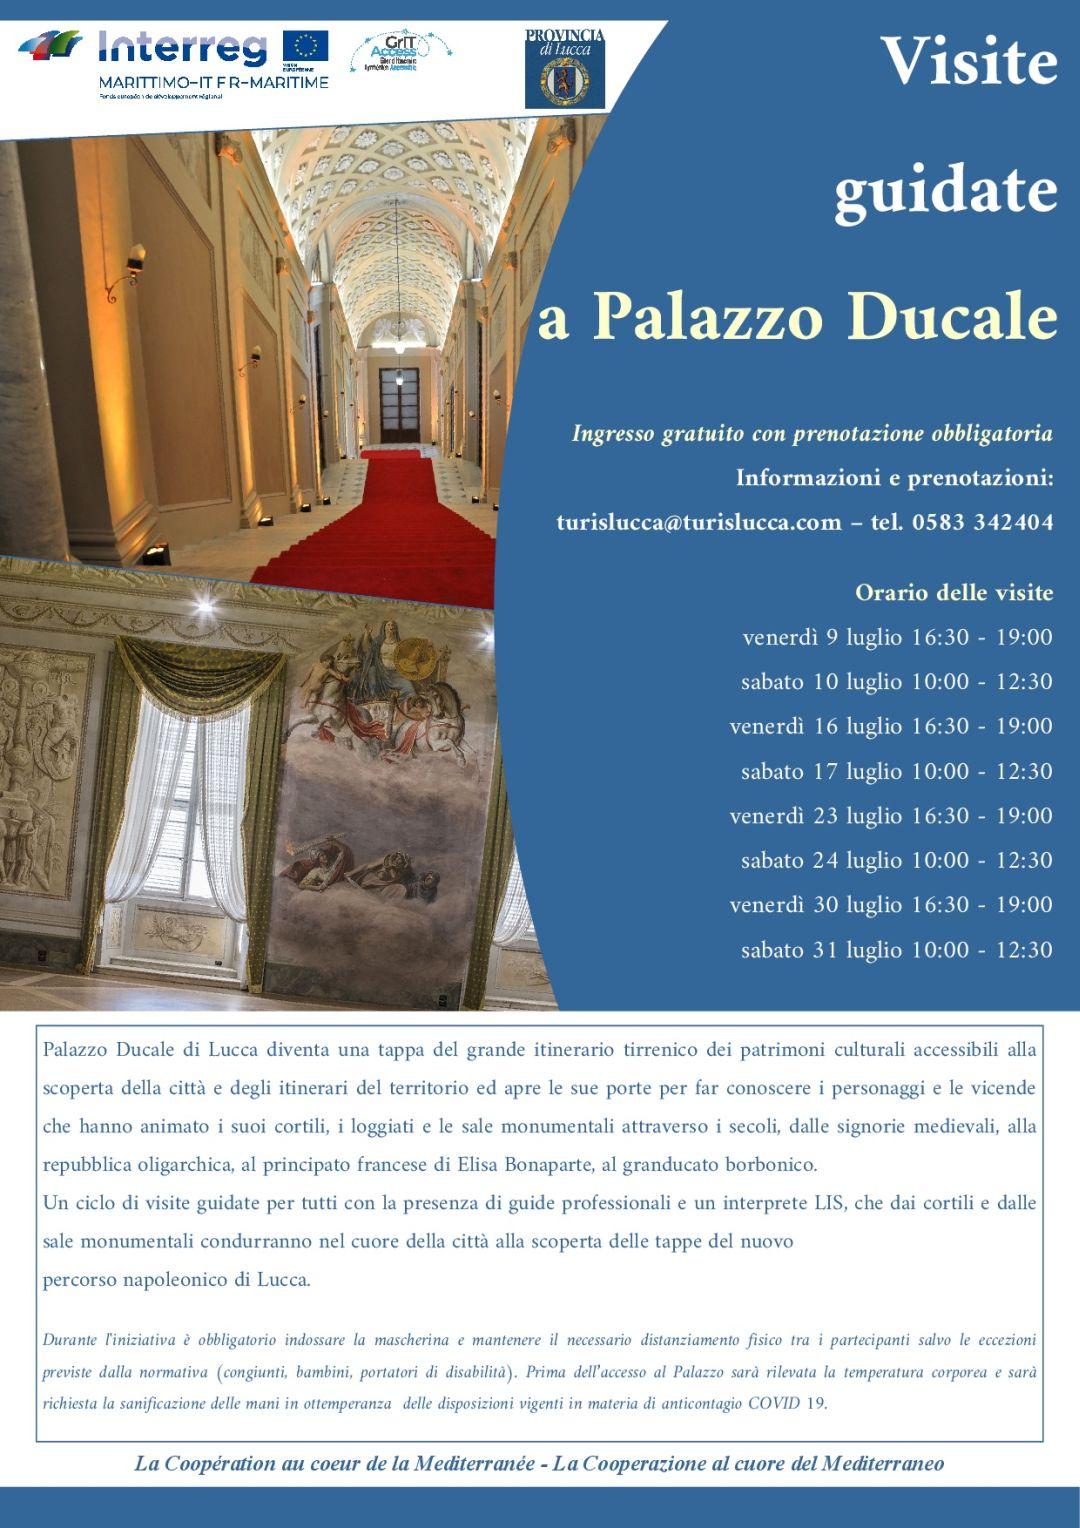 locandina visite guidate a Palazzo ducale di Lucca (anche LIS)